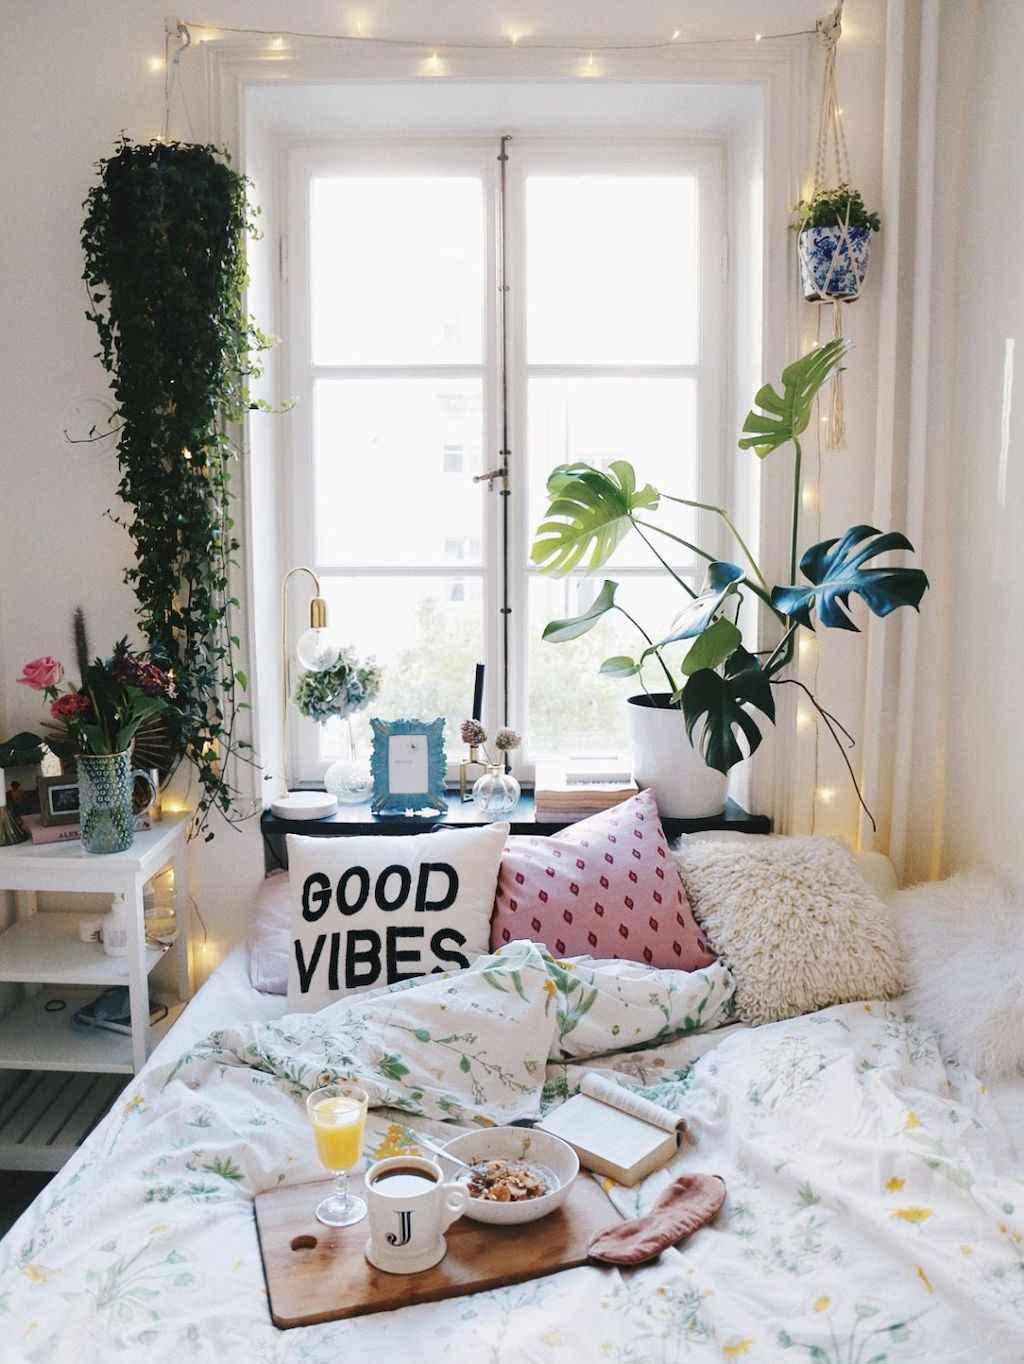 Cute diy dorm room decorating ideas on a budget (69)